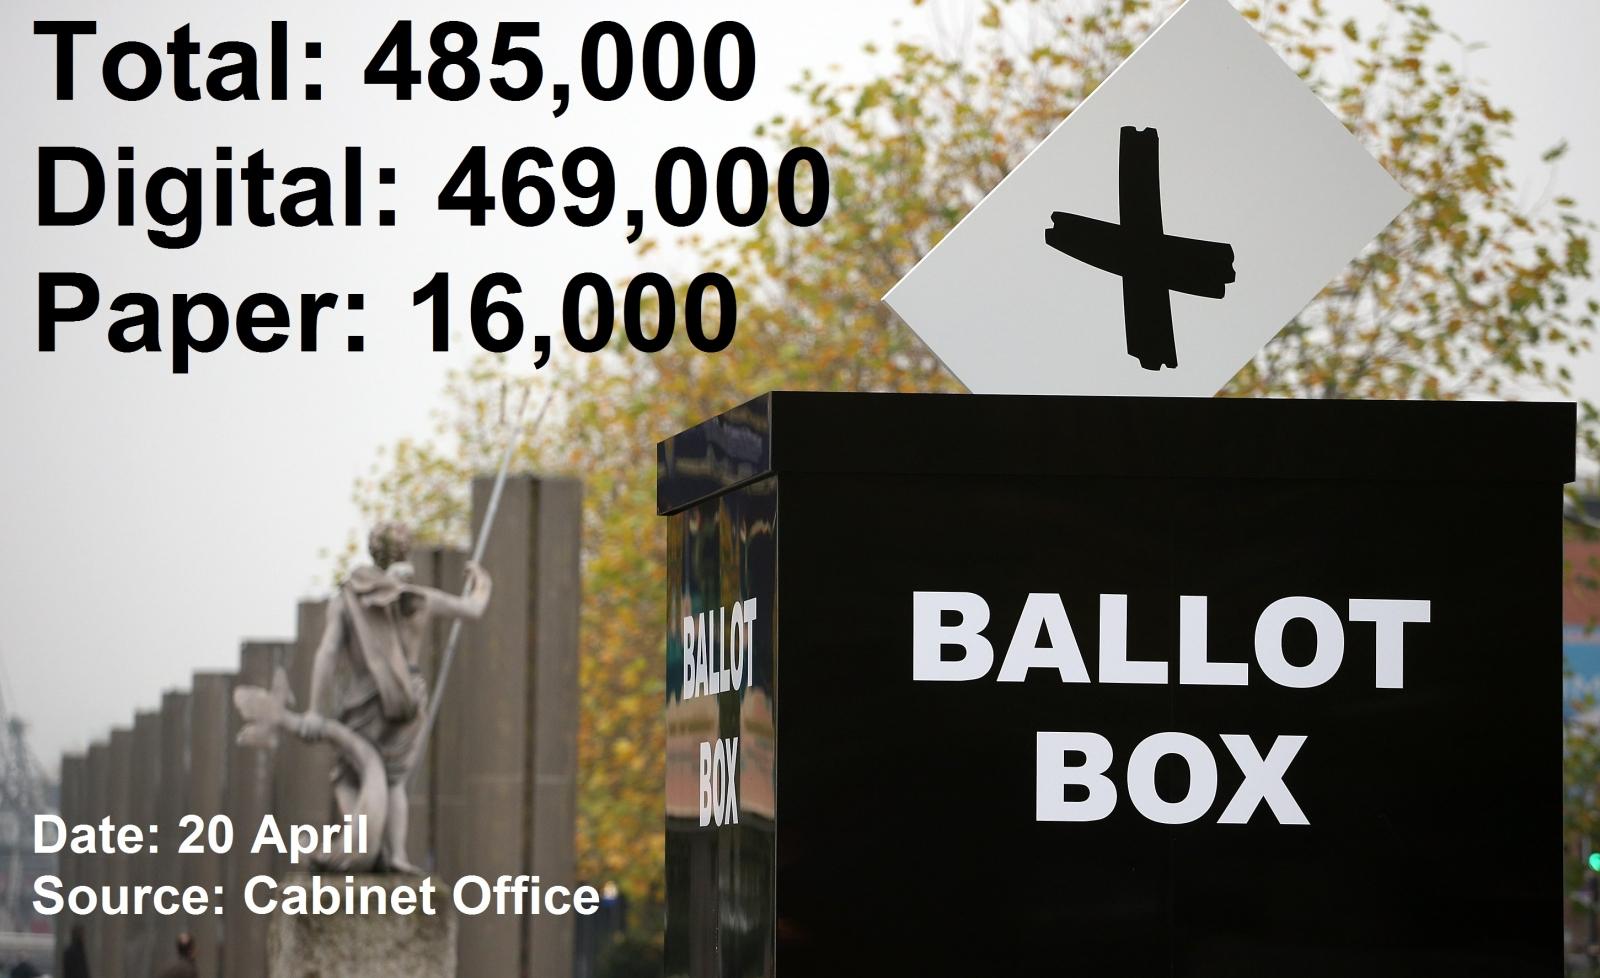 Cabinet Office data